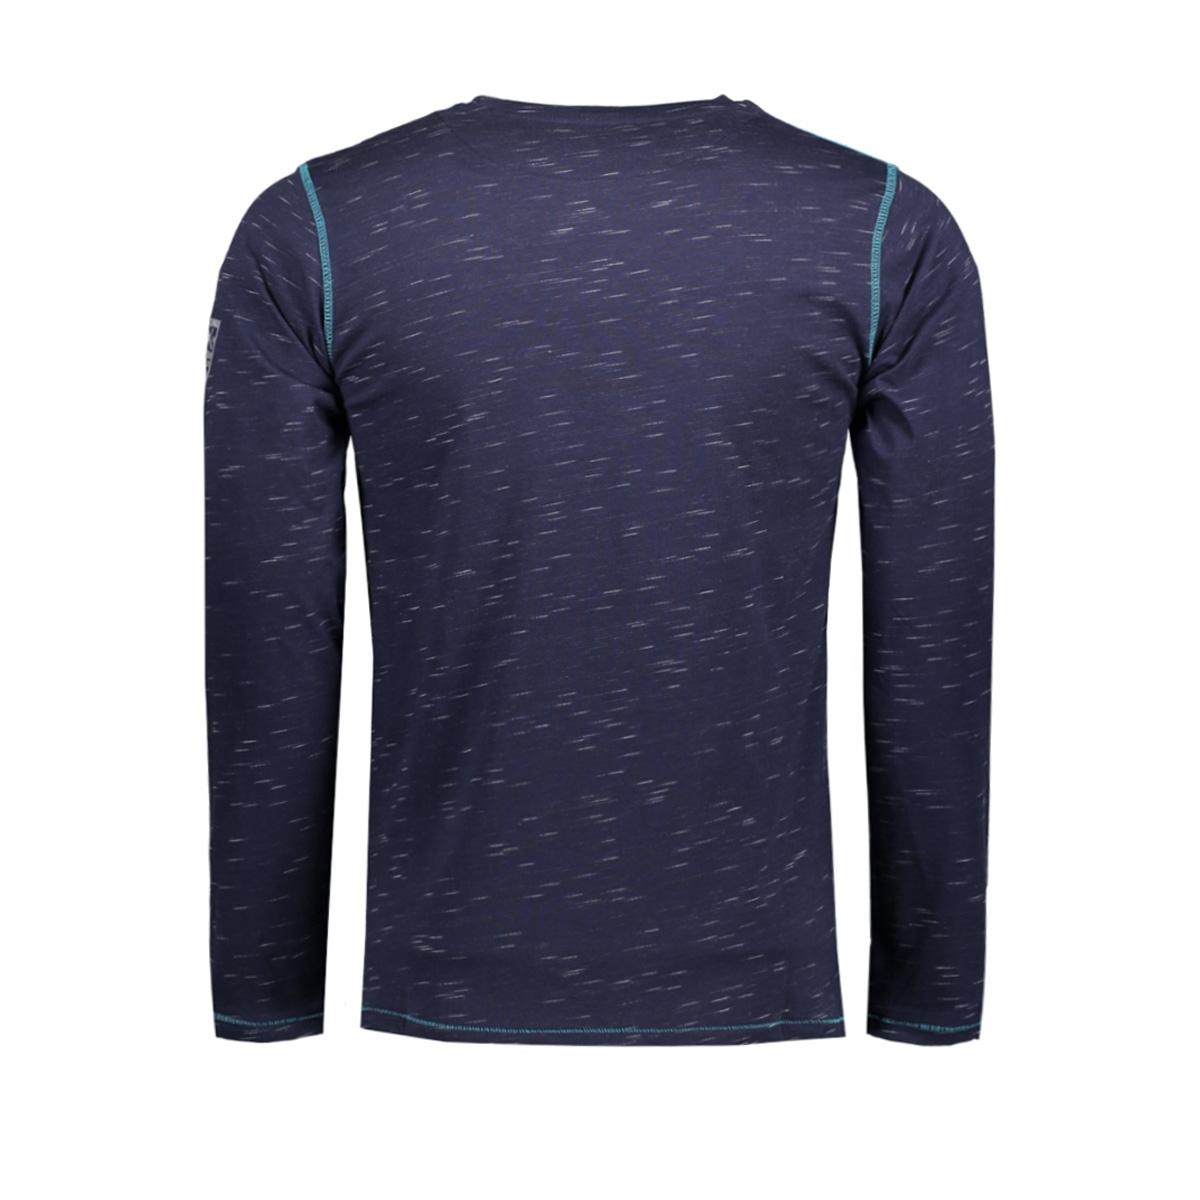 5386 gabbiano t-shirt navy